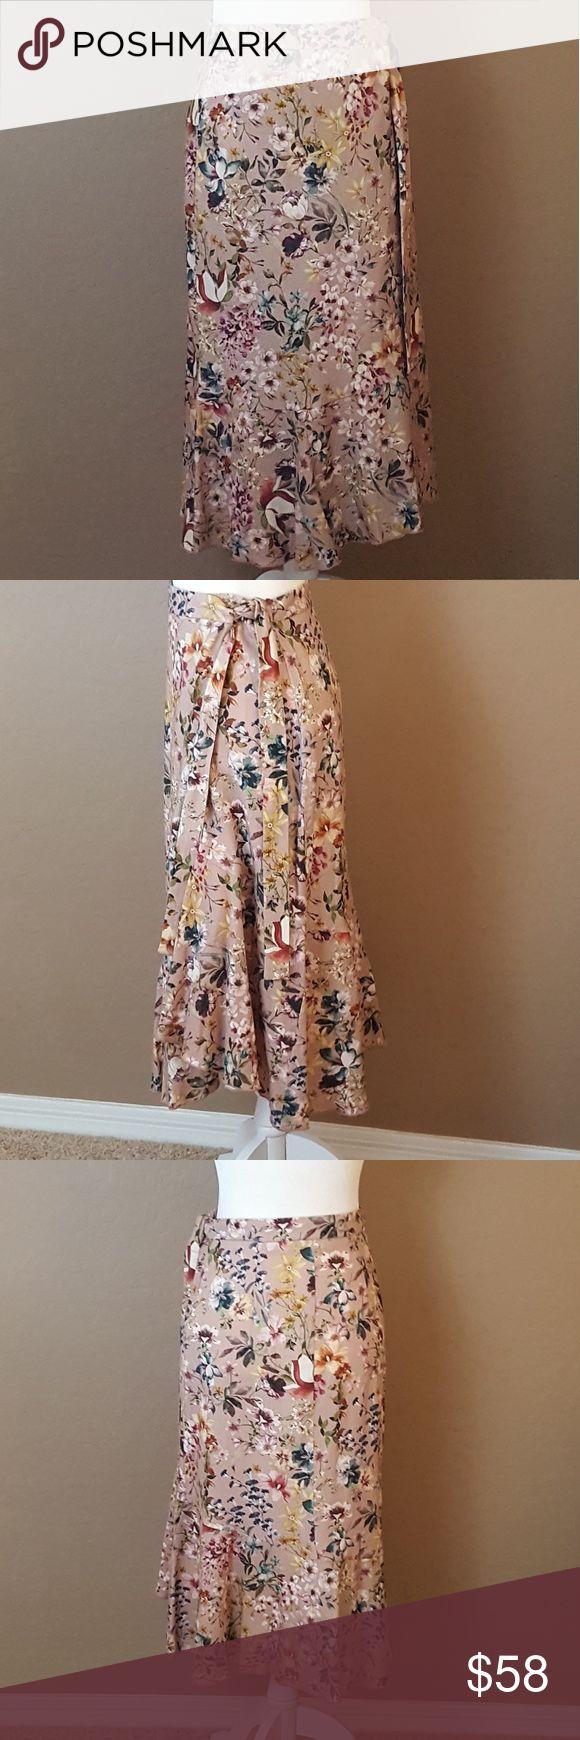 🆕 ZARA - Floral Wrap Skirt Linen and Viscose Blend. Two Button Hidden Closures at Waist. Side Tie. Trumpet Bottom. US Size: M Zara Skirts Midi